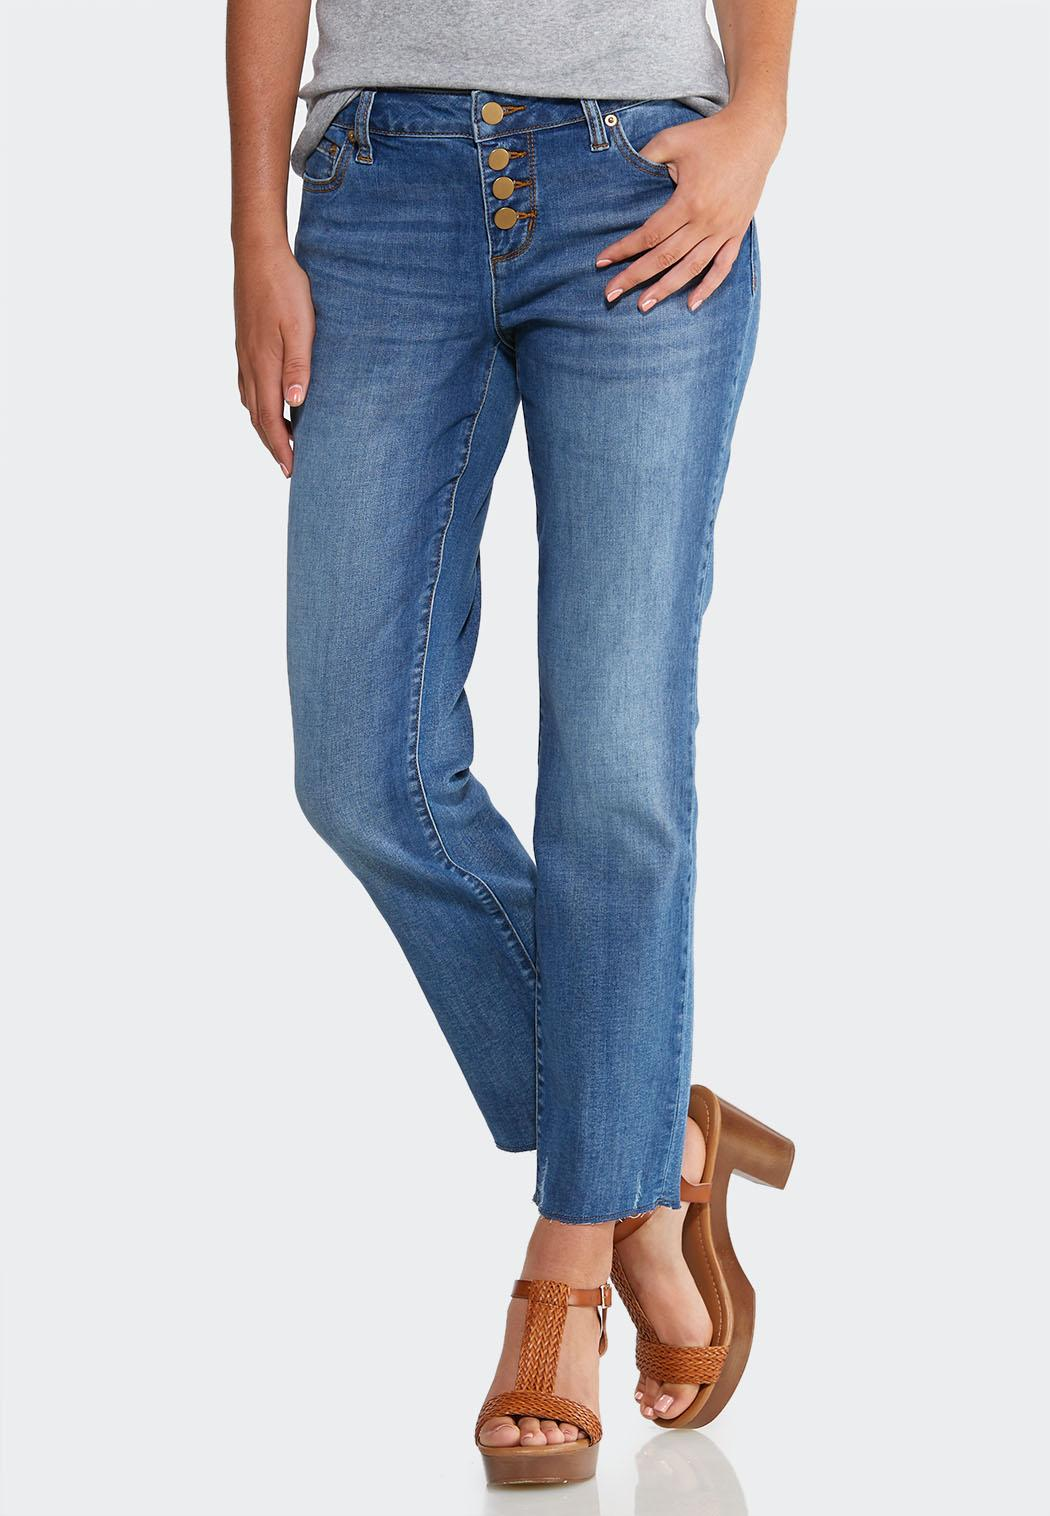 Buttonfly Raw Hem Jeans